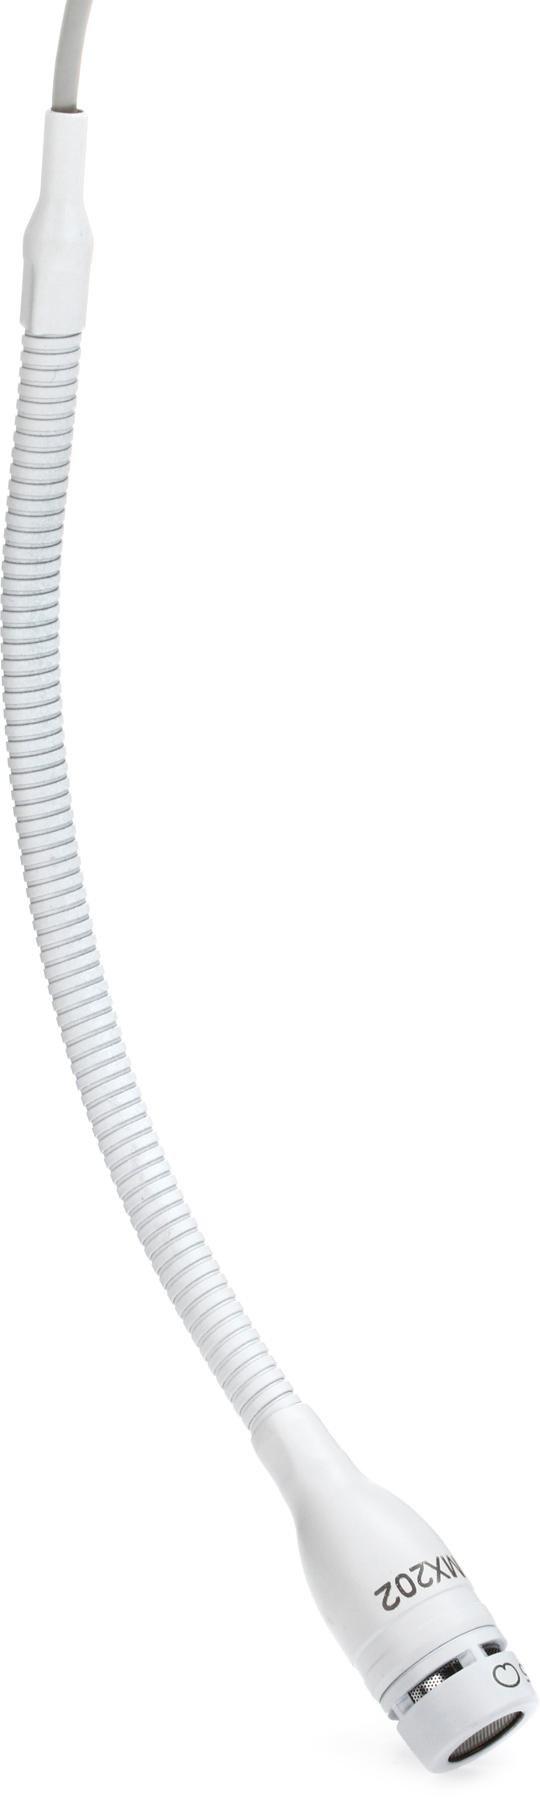 Cardioid Shure MX202W-A//C White Overhead Microphone